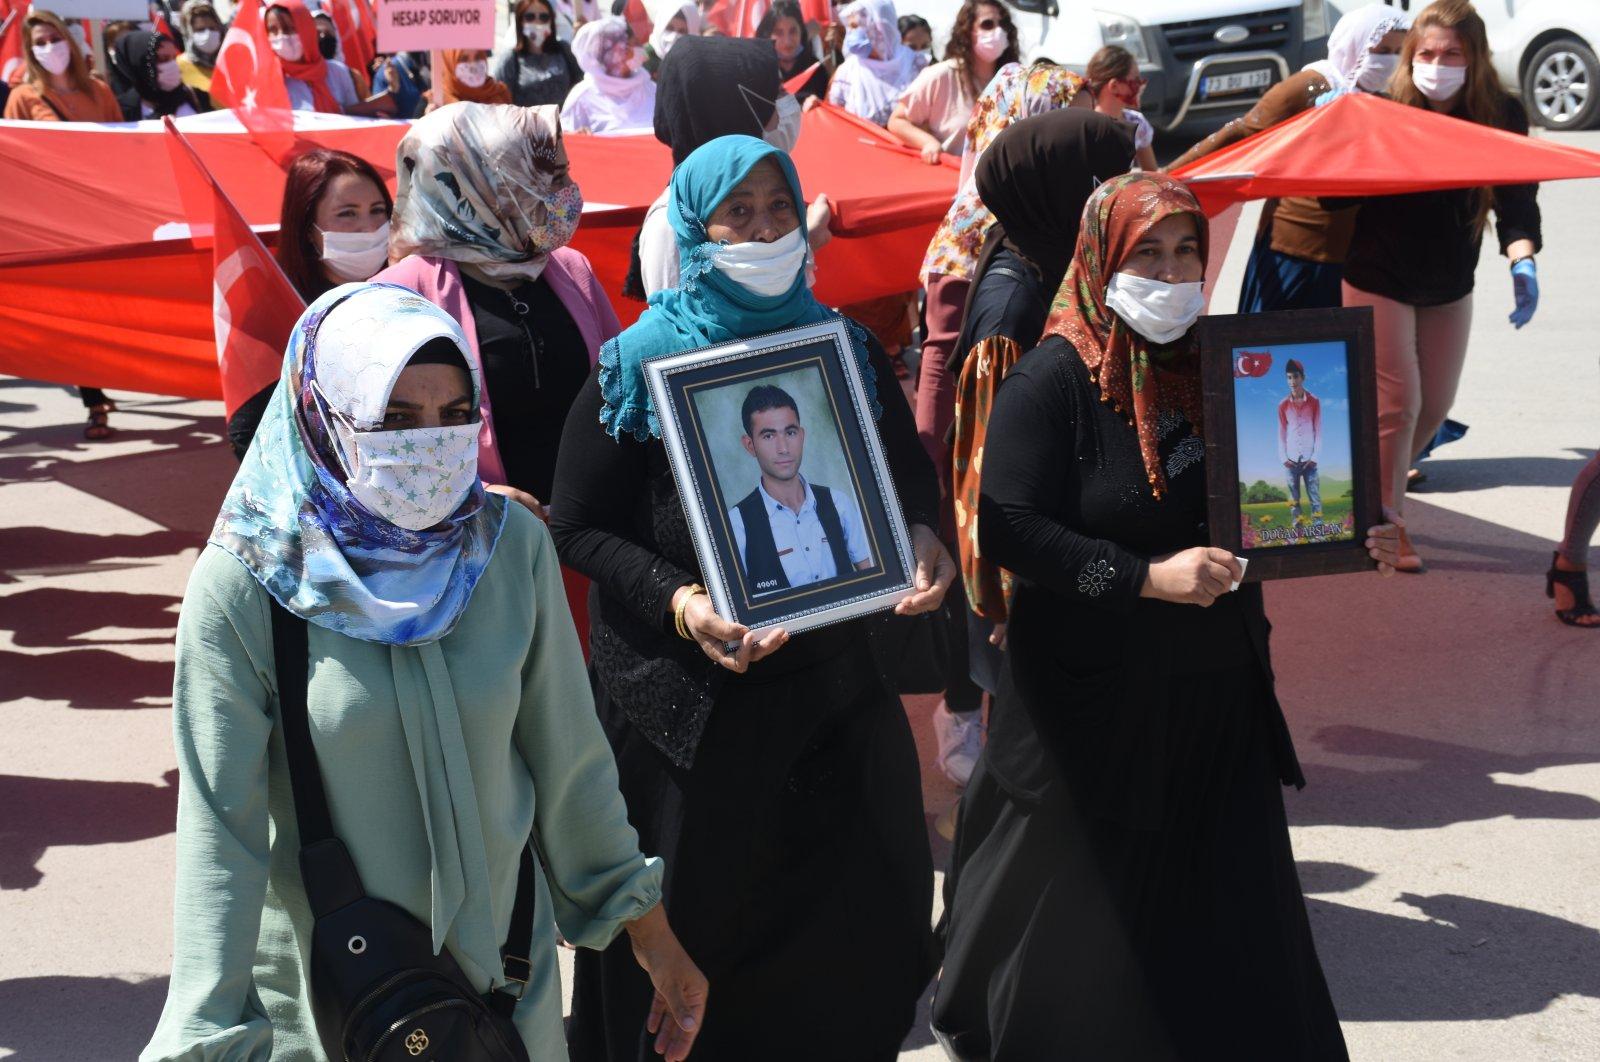 Women march in protest of the PKK terrorist group in southeastern Şırnak province, Turkey, Sept. 10, 2020. (AA Photo)